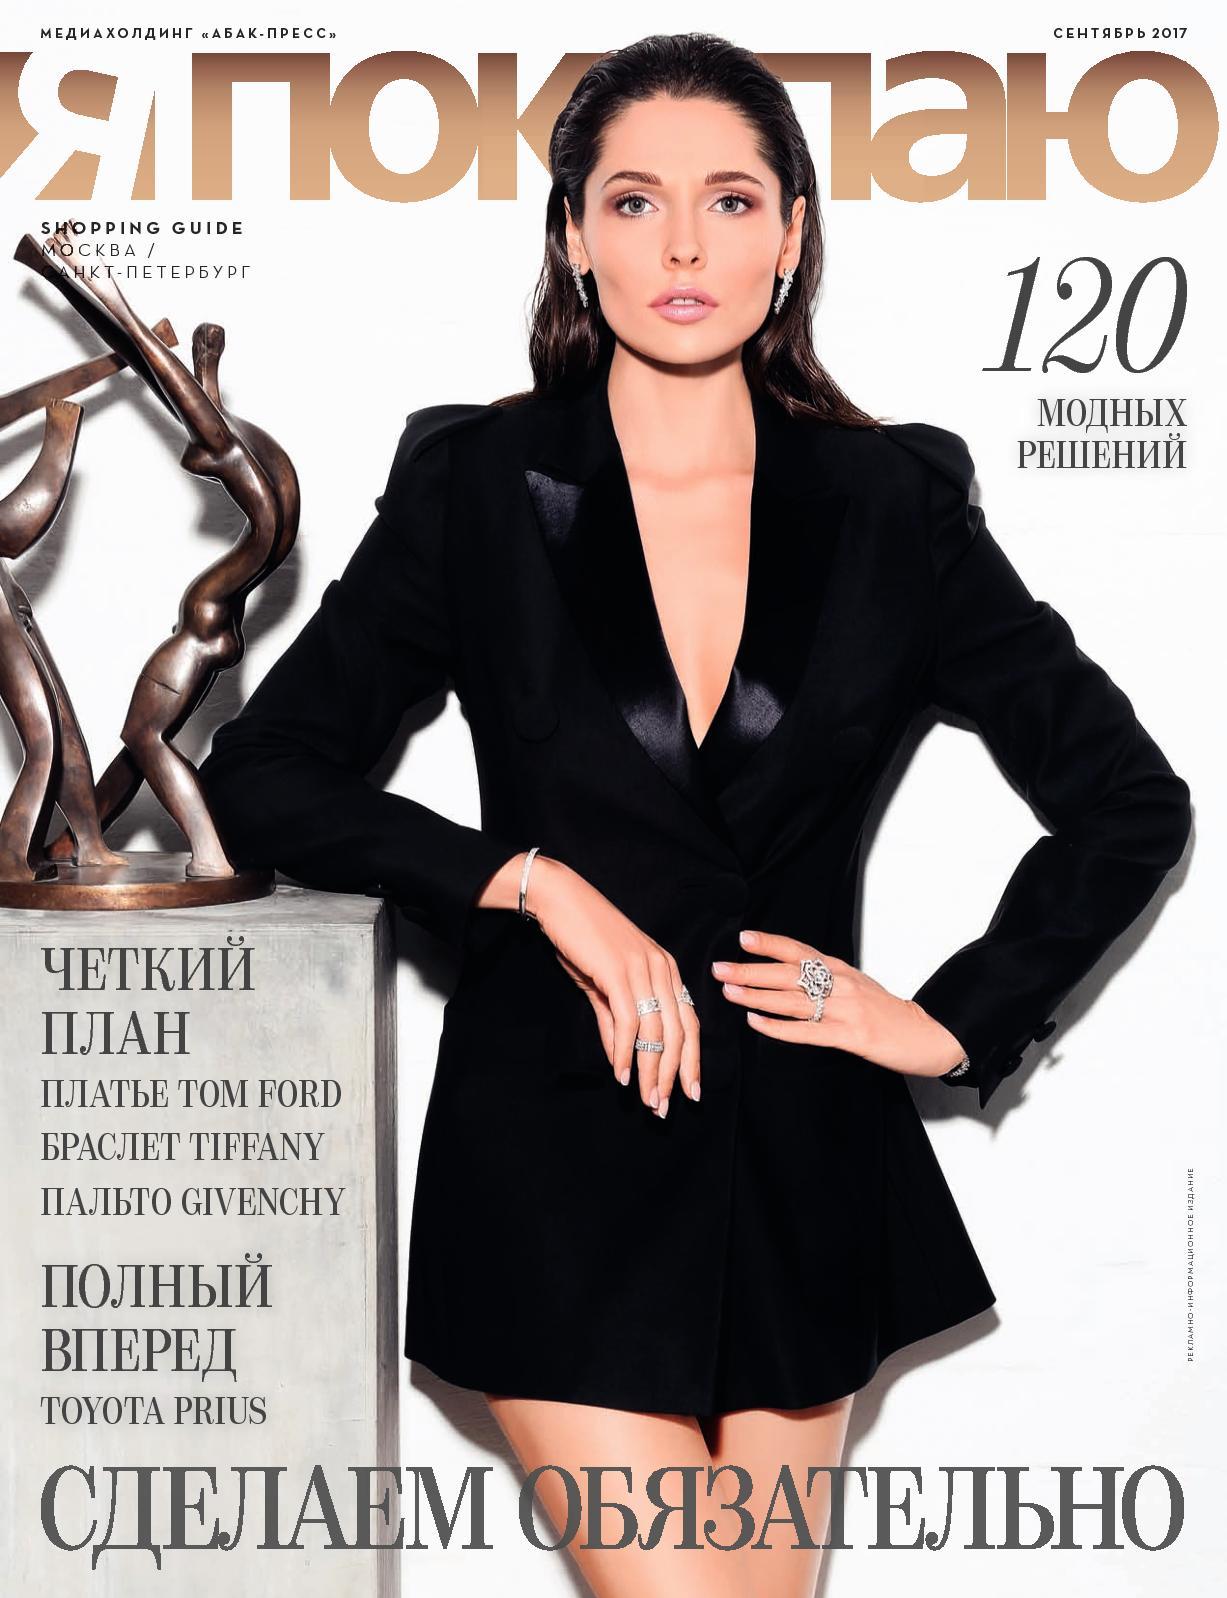 8a15ccfe34f2 Calaméo - Shopping Guide «Я Покупаю. Москва - Санкт-Петербург», сентябрь  2017